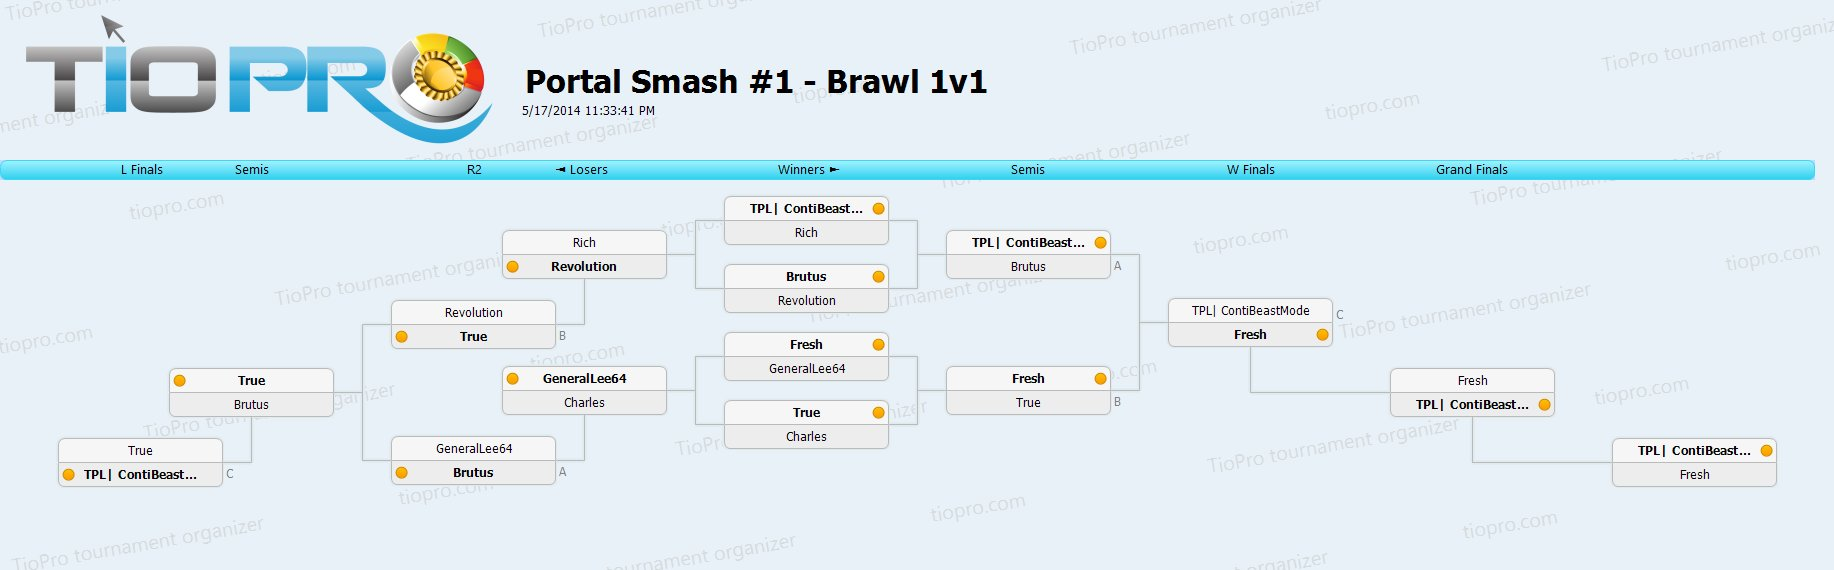 Portal Smash :: Brawl 1v1